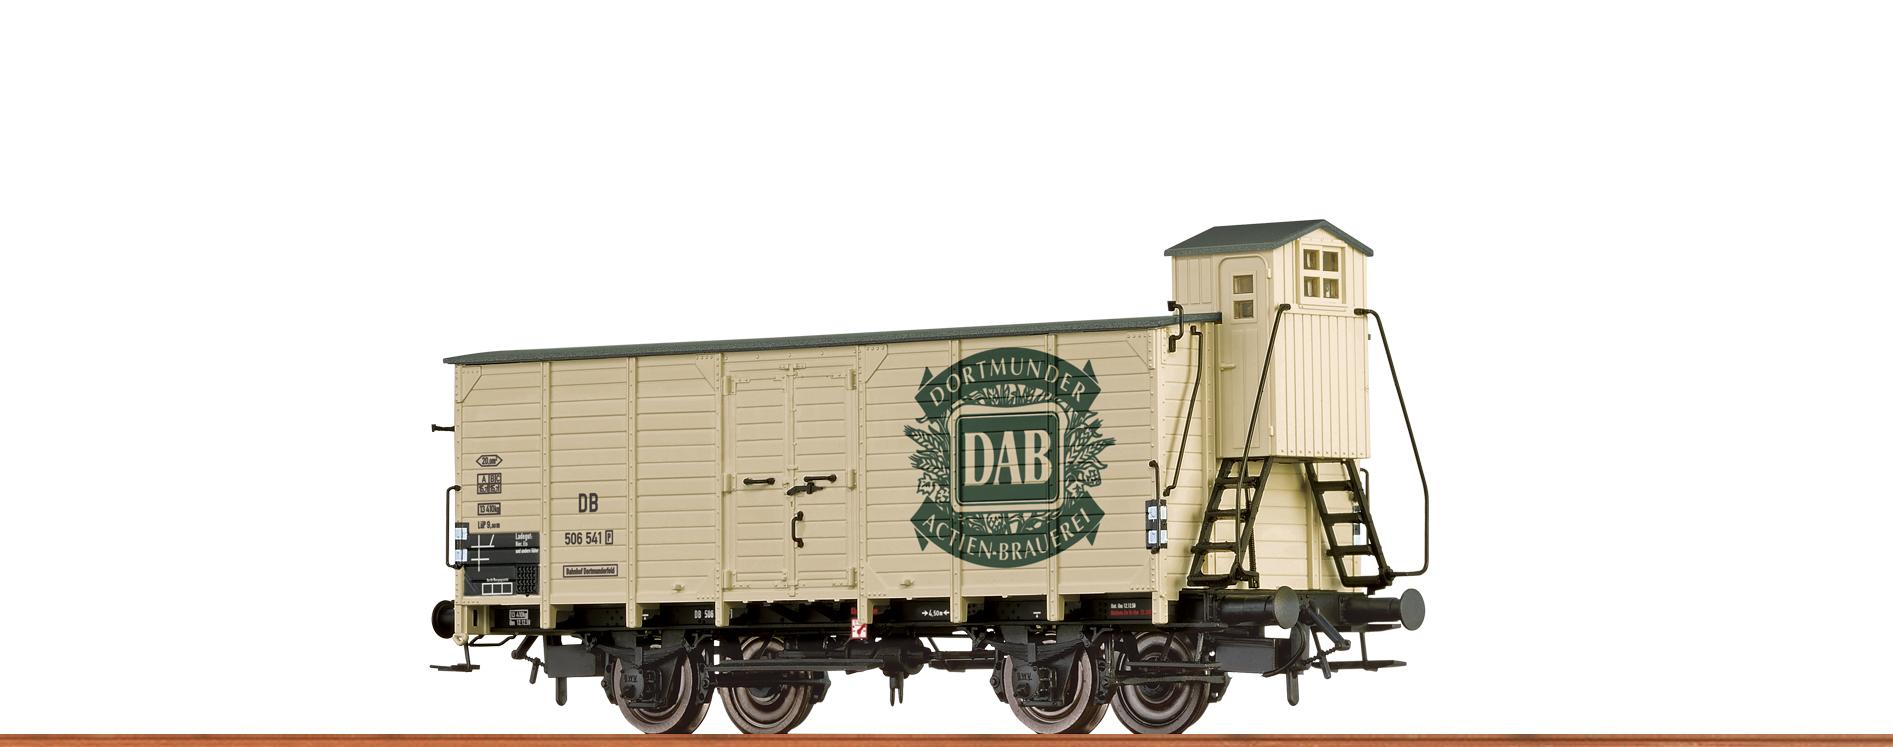 BRAWA 67476 Spur N Bierwagen G10 DB, III, DAB